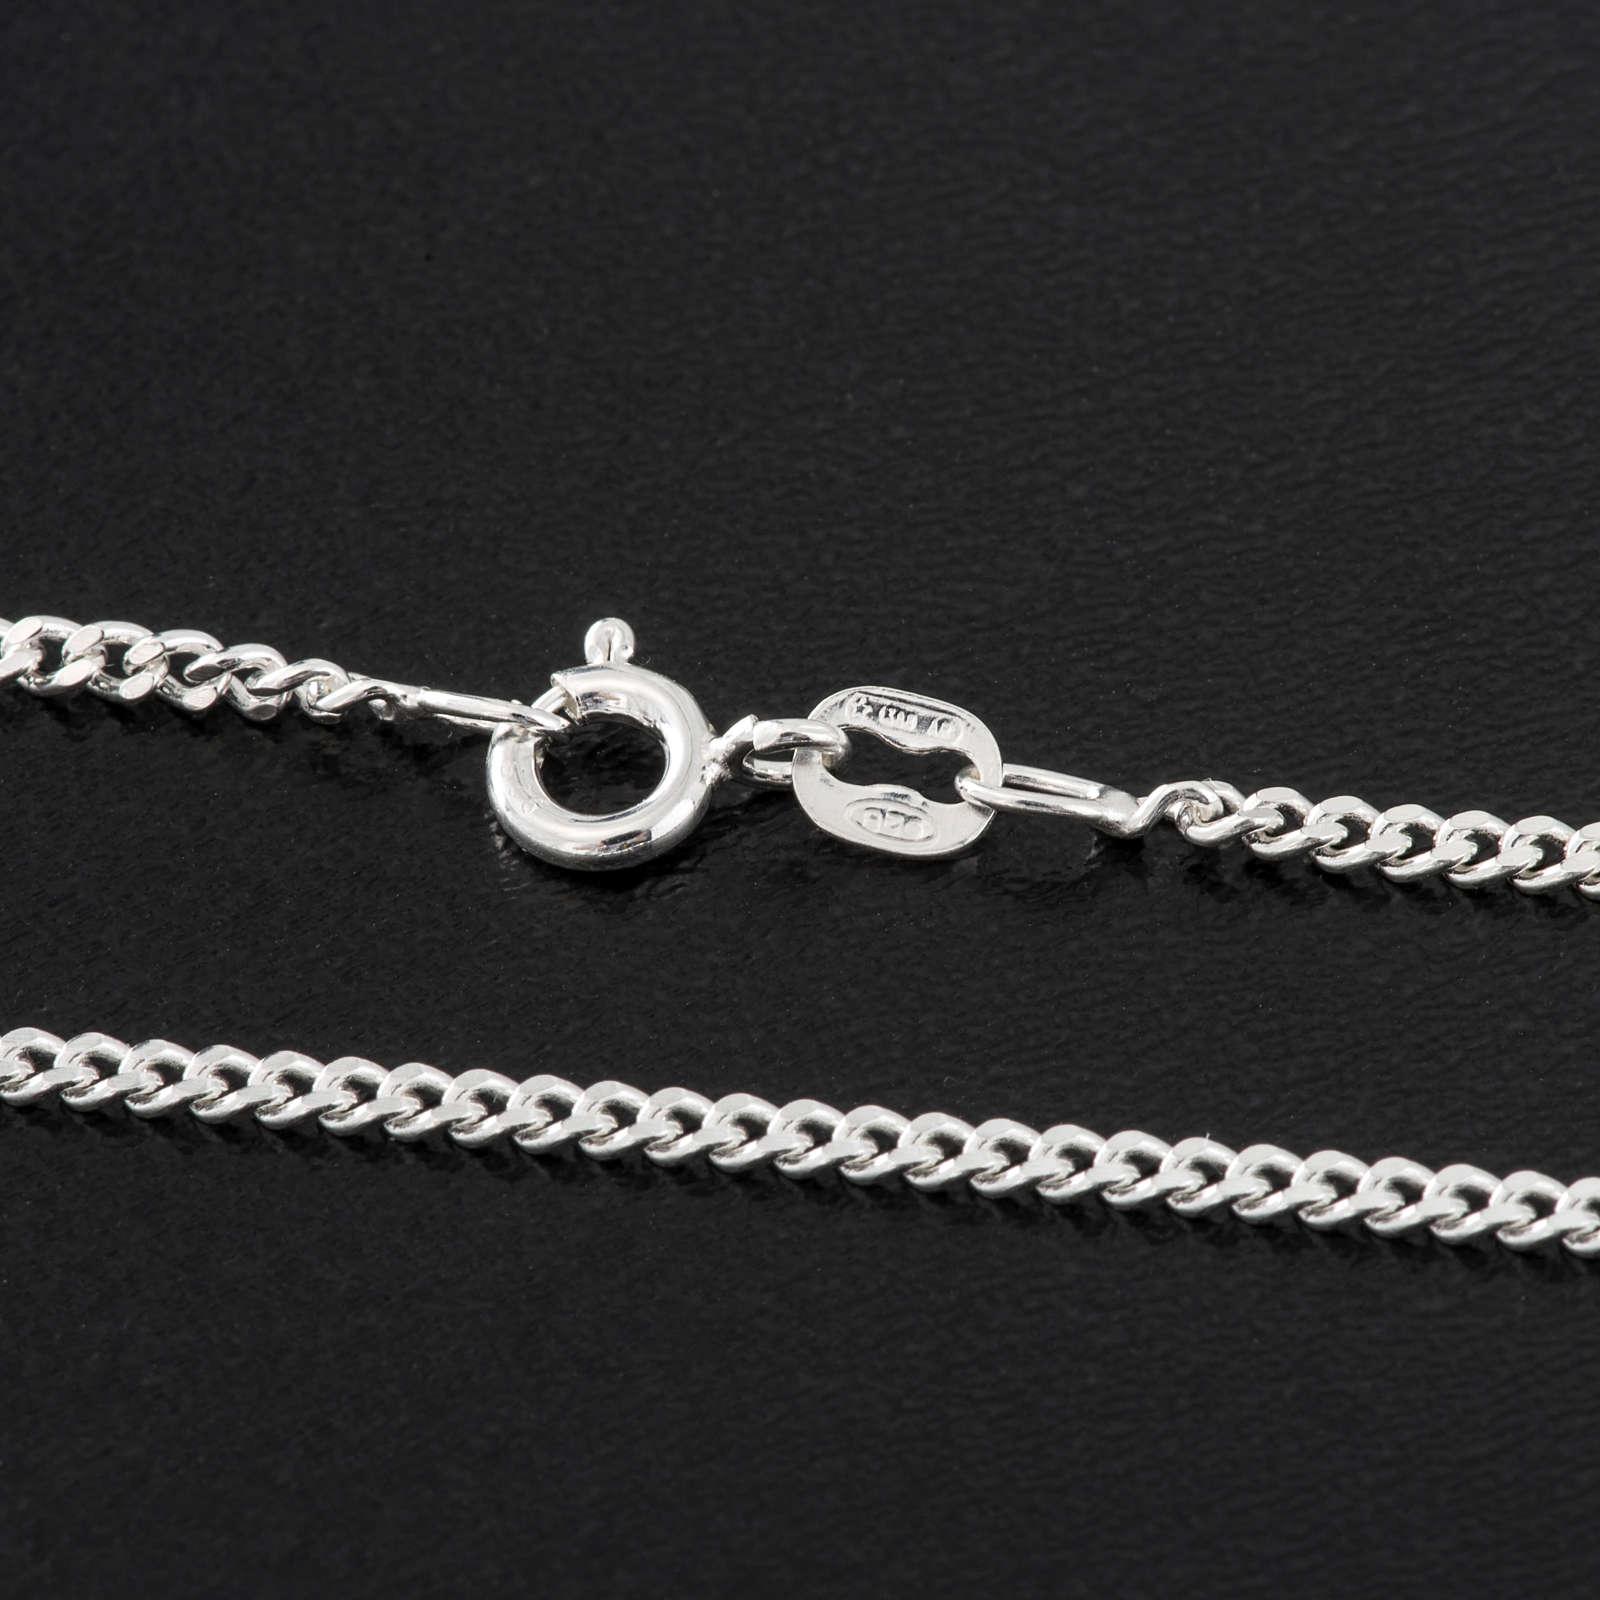 Grumetta chain in sterling silver 60cm 4